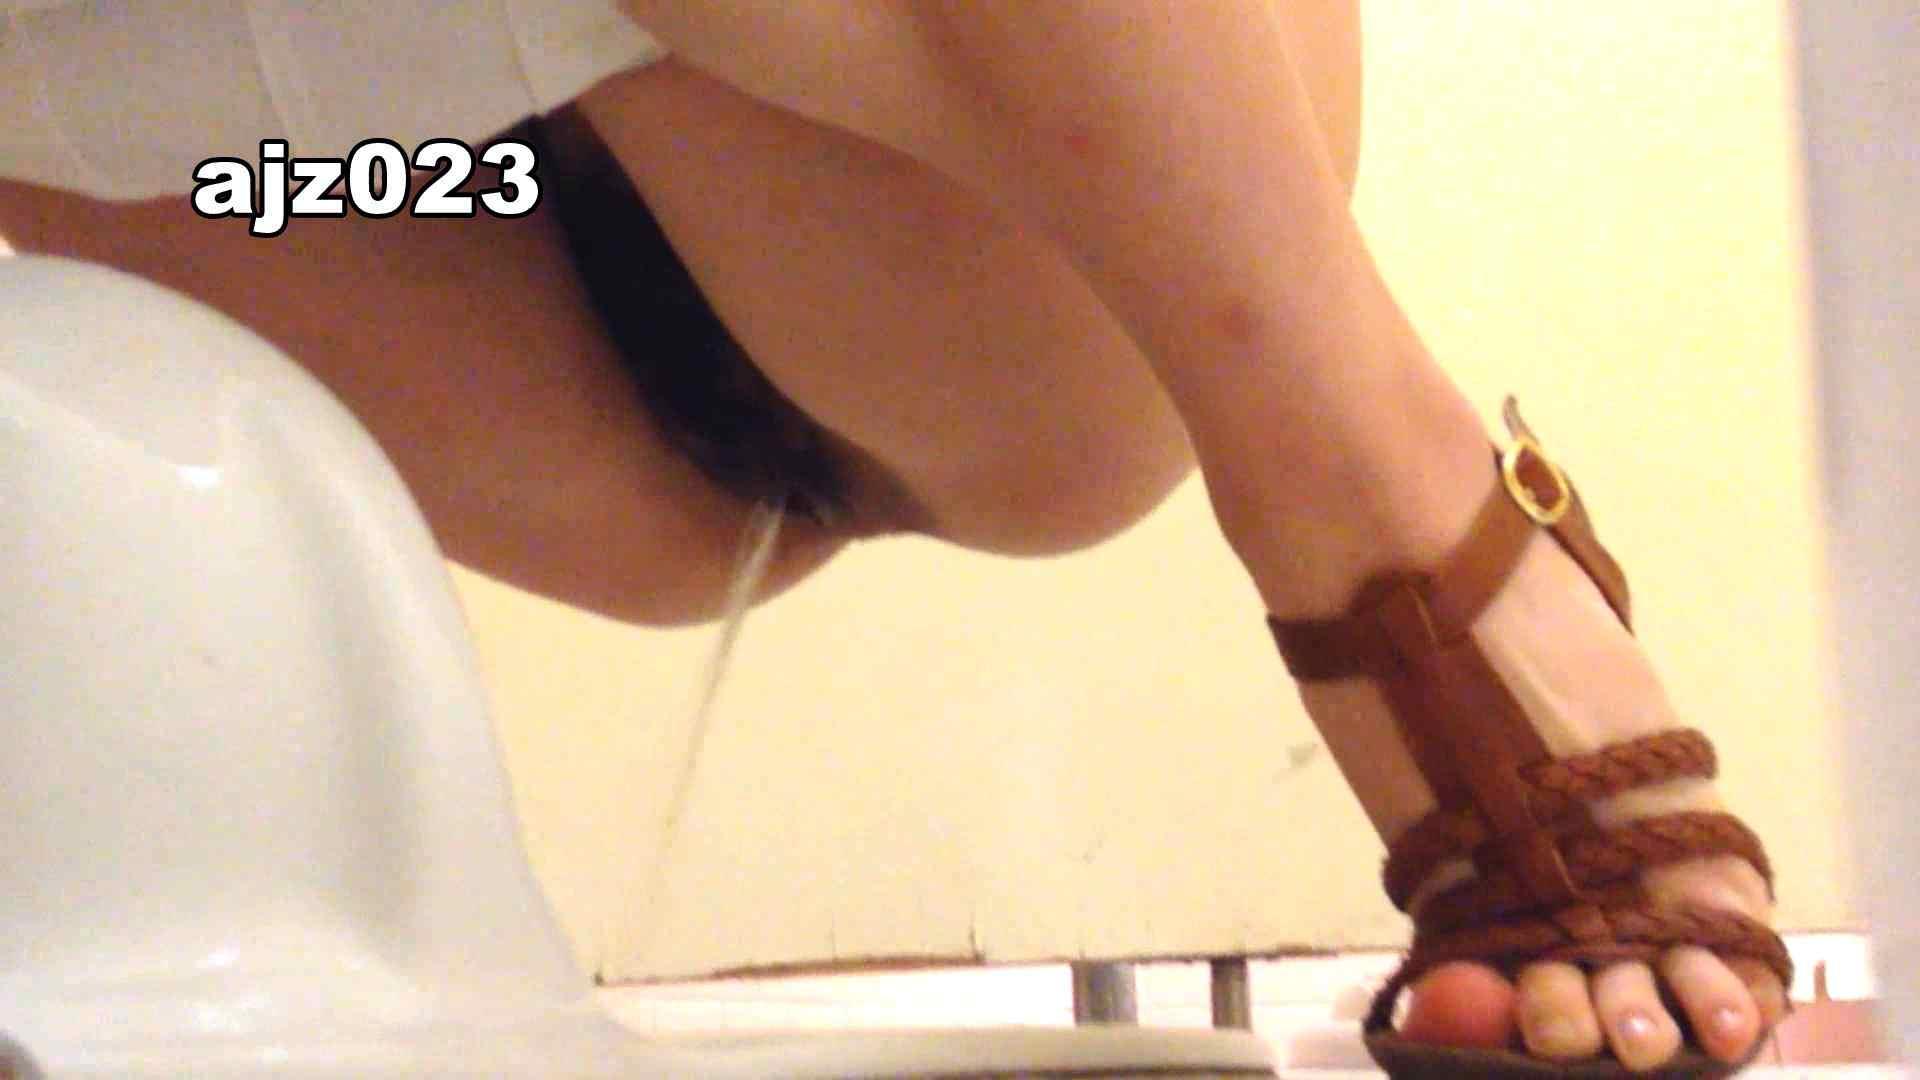 某有名大学女性洗面所 vol.23 洗面所 隠し撮りオマンコ動画紹介 101画像 43